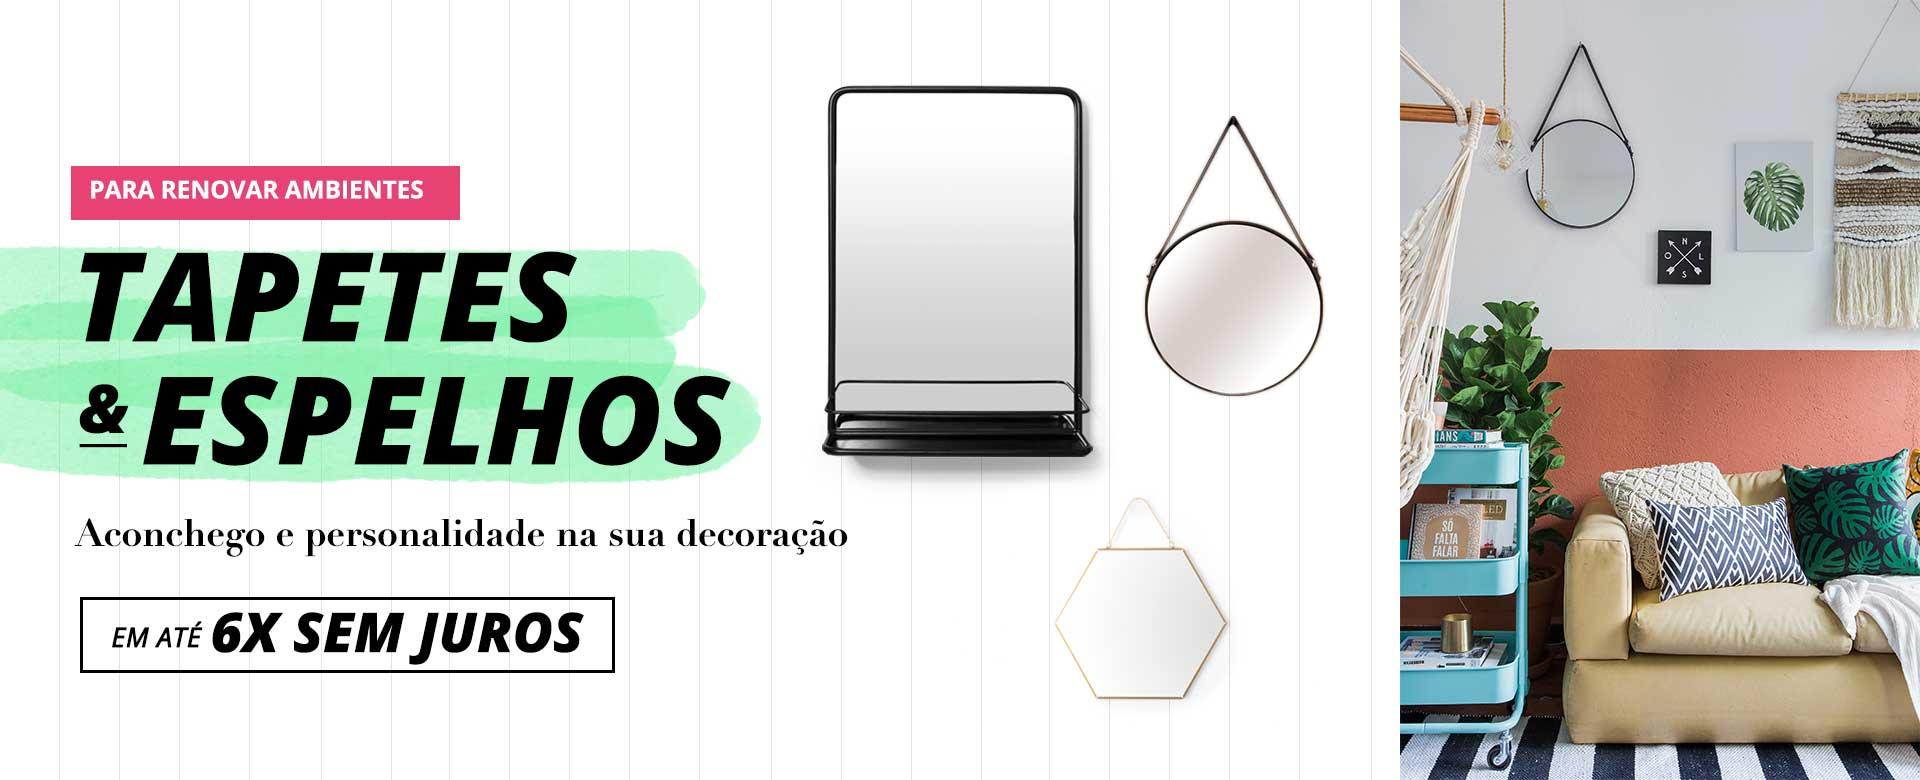 A - Tapetes Espelhos